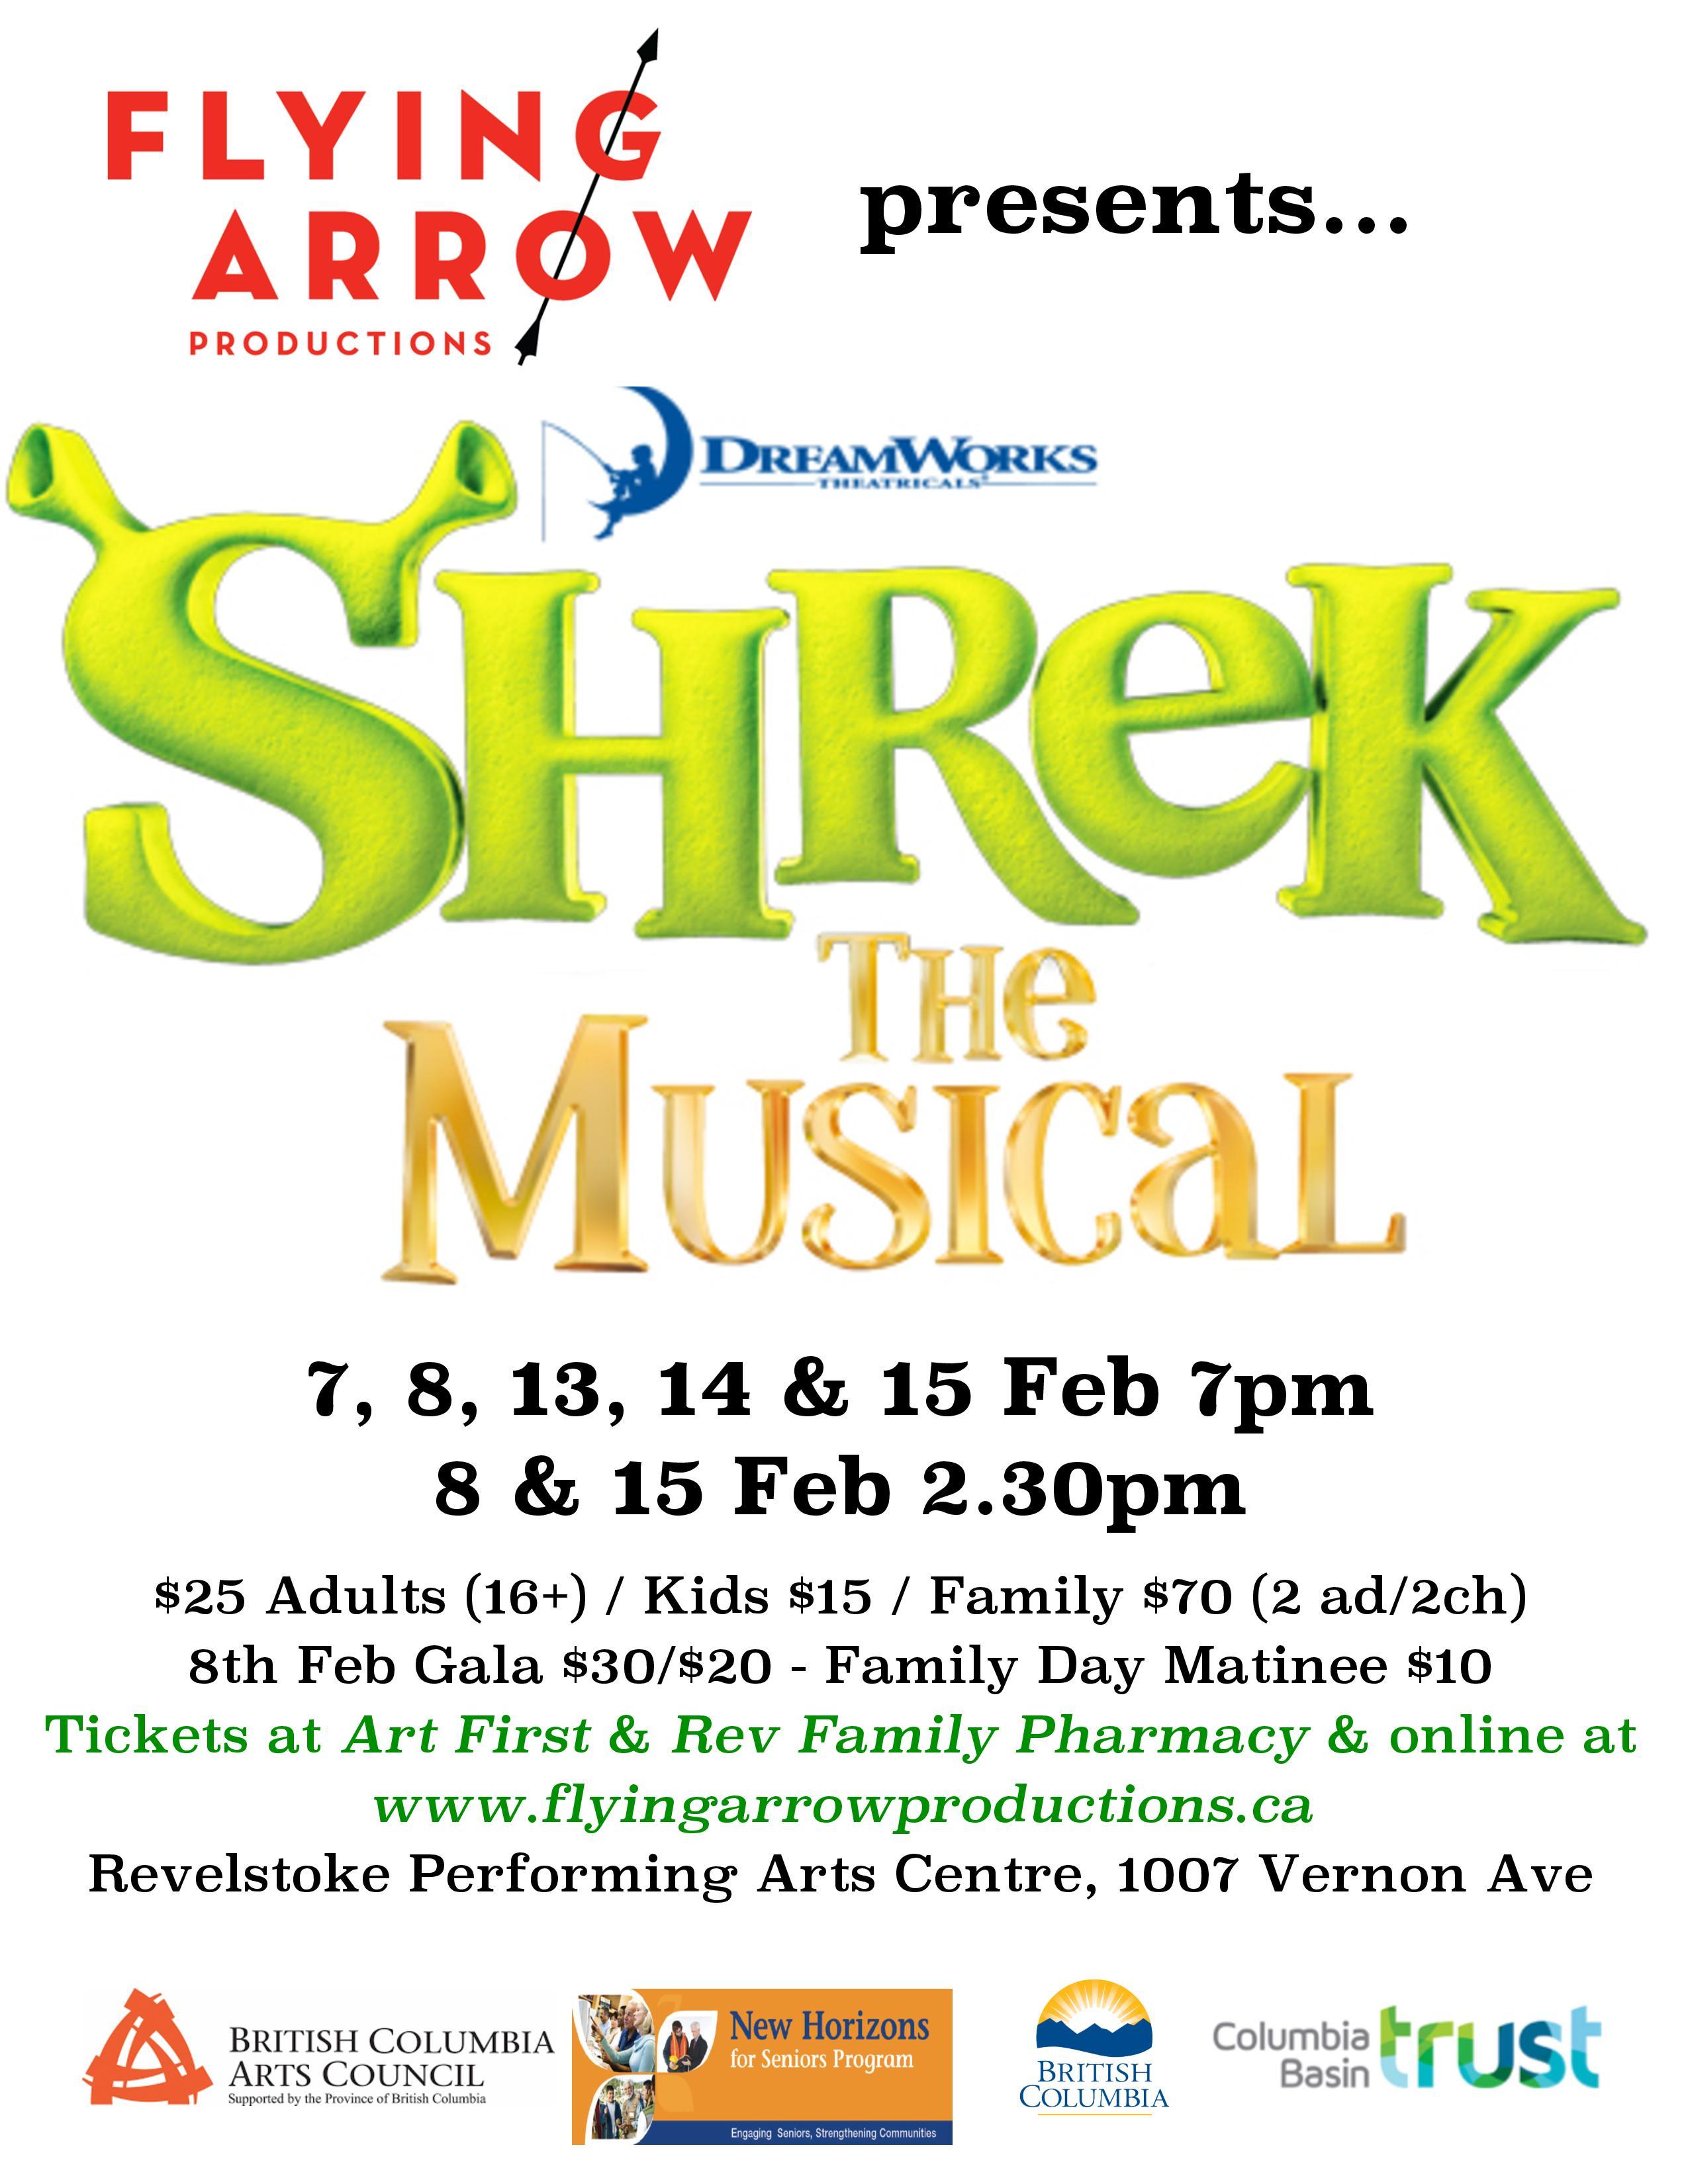 Shrek the Musical GALA Event @ Revelstoke Performing Arts Centre |  |  |